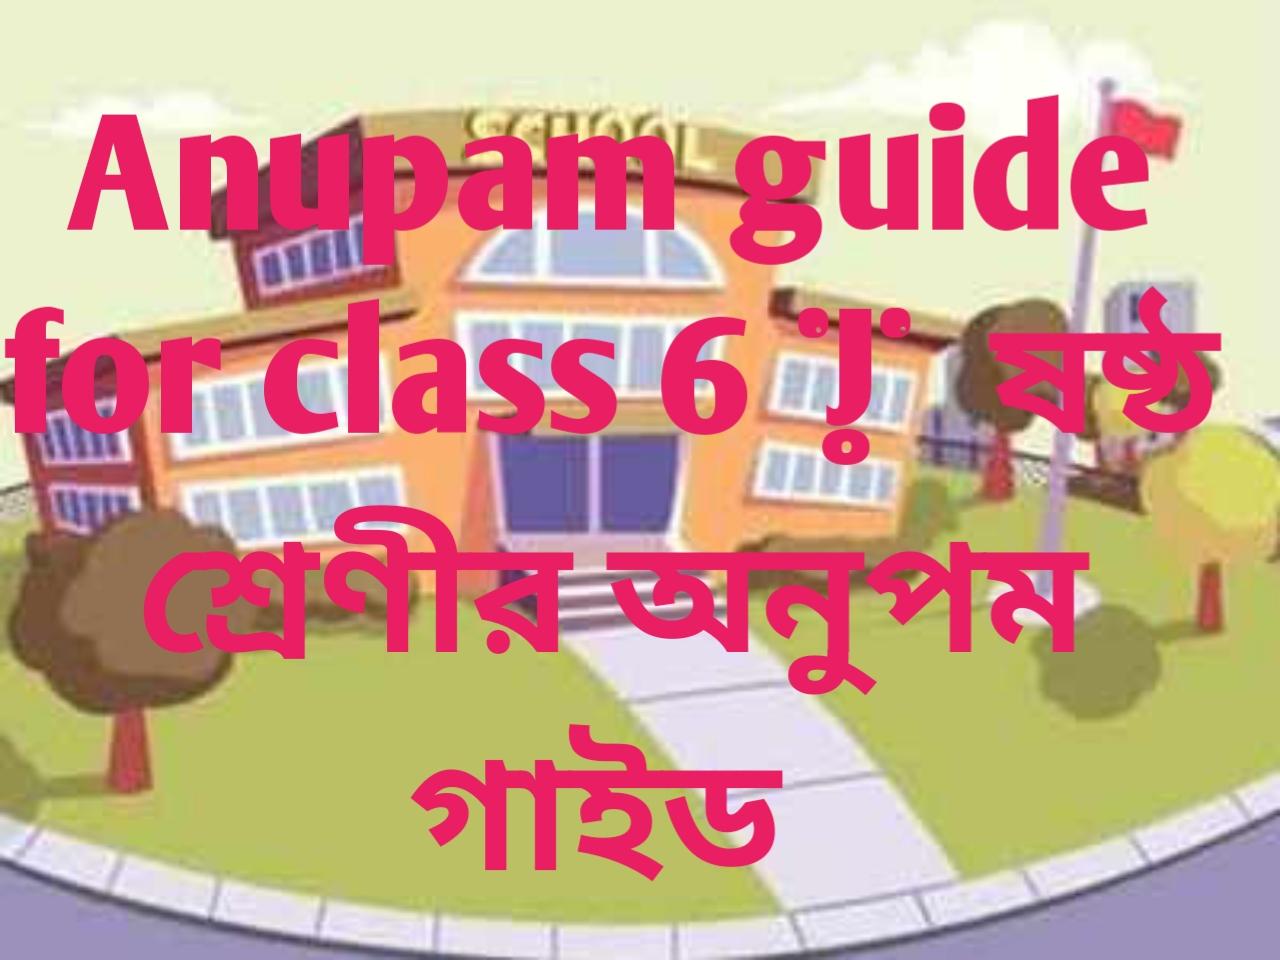 class 6 anupam guide 2021, class 6 anupam guide pdf, class 6 anupam guide book 2021, class 6 math solution anupam guide, anupam guide class 6, anupam guide for class 6, anupam guide for class 6 english, anupam guide for class 6 math, anupam guide for class 6 science, anupam guide for class 6 Bangladesh and global studies, anupam guide for class 6, anupam guide for class 6 hindu dharma, anupam guide for class 6 ICT, anupam guide for class 6 home science, anupam guide for class 6 agriculture education, anupam guide for class 6 physical education, ষষ্ট শ্রেণীর বাংলা গাইড অনুপম ডাউনলোড, ষষ্ট শ্রেণীর বাংলা গাইড এর পিডিএফ, ষষ্ট শ্রেণির বাংলা অনুপম গাইড পিডিএফ ২০২১, ষষ্ট শ্রেণীর অনুপম গাইড ২০২১, ষষ্ট শ্রেণির ইংরেজি অনুপম গাইড, ষষ্ট শ্রেণীর গণিত অনুপম গাইড, ষষ্ট শ্রেণীর অনুপম গাইড বিজ্ঞান, ষষ্ট শ্রেণীর অনুপম গাইড বাংলাদেশ ও বিশ্বপরিচয়, ষষ্ট শ্রেণীর অনুপম গাইড ইসলাম শিক্ষা, ষষ্ট শ্রেণীর অনুপম গাইড হিন্দুধর্ম, ষষ্ট শ্রেণীর অনুপম গাইড গার্হস্থ্য বিজ্ঞান, ষষ্ট শ্রেণীর অনুপম গাইড কৃষি শিক্ষা, ষষ্ট শ্রেণীর অনুপম গাইড তথ্য যোগাযোগ প্রযুক্তি, ষষ্ট শ্রেণীর অনুপম গাইড শারীরিক শিক্ষা,